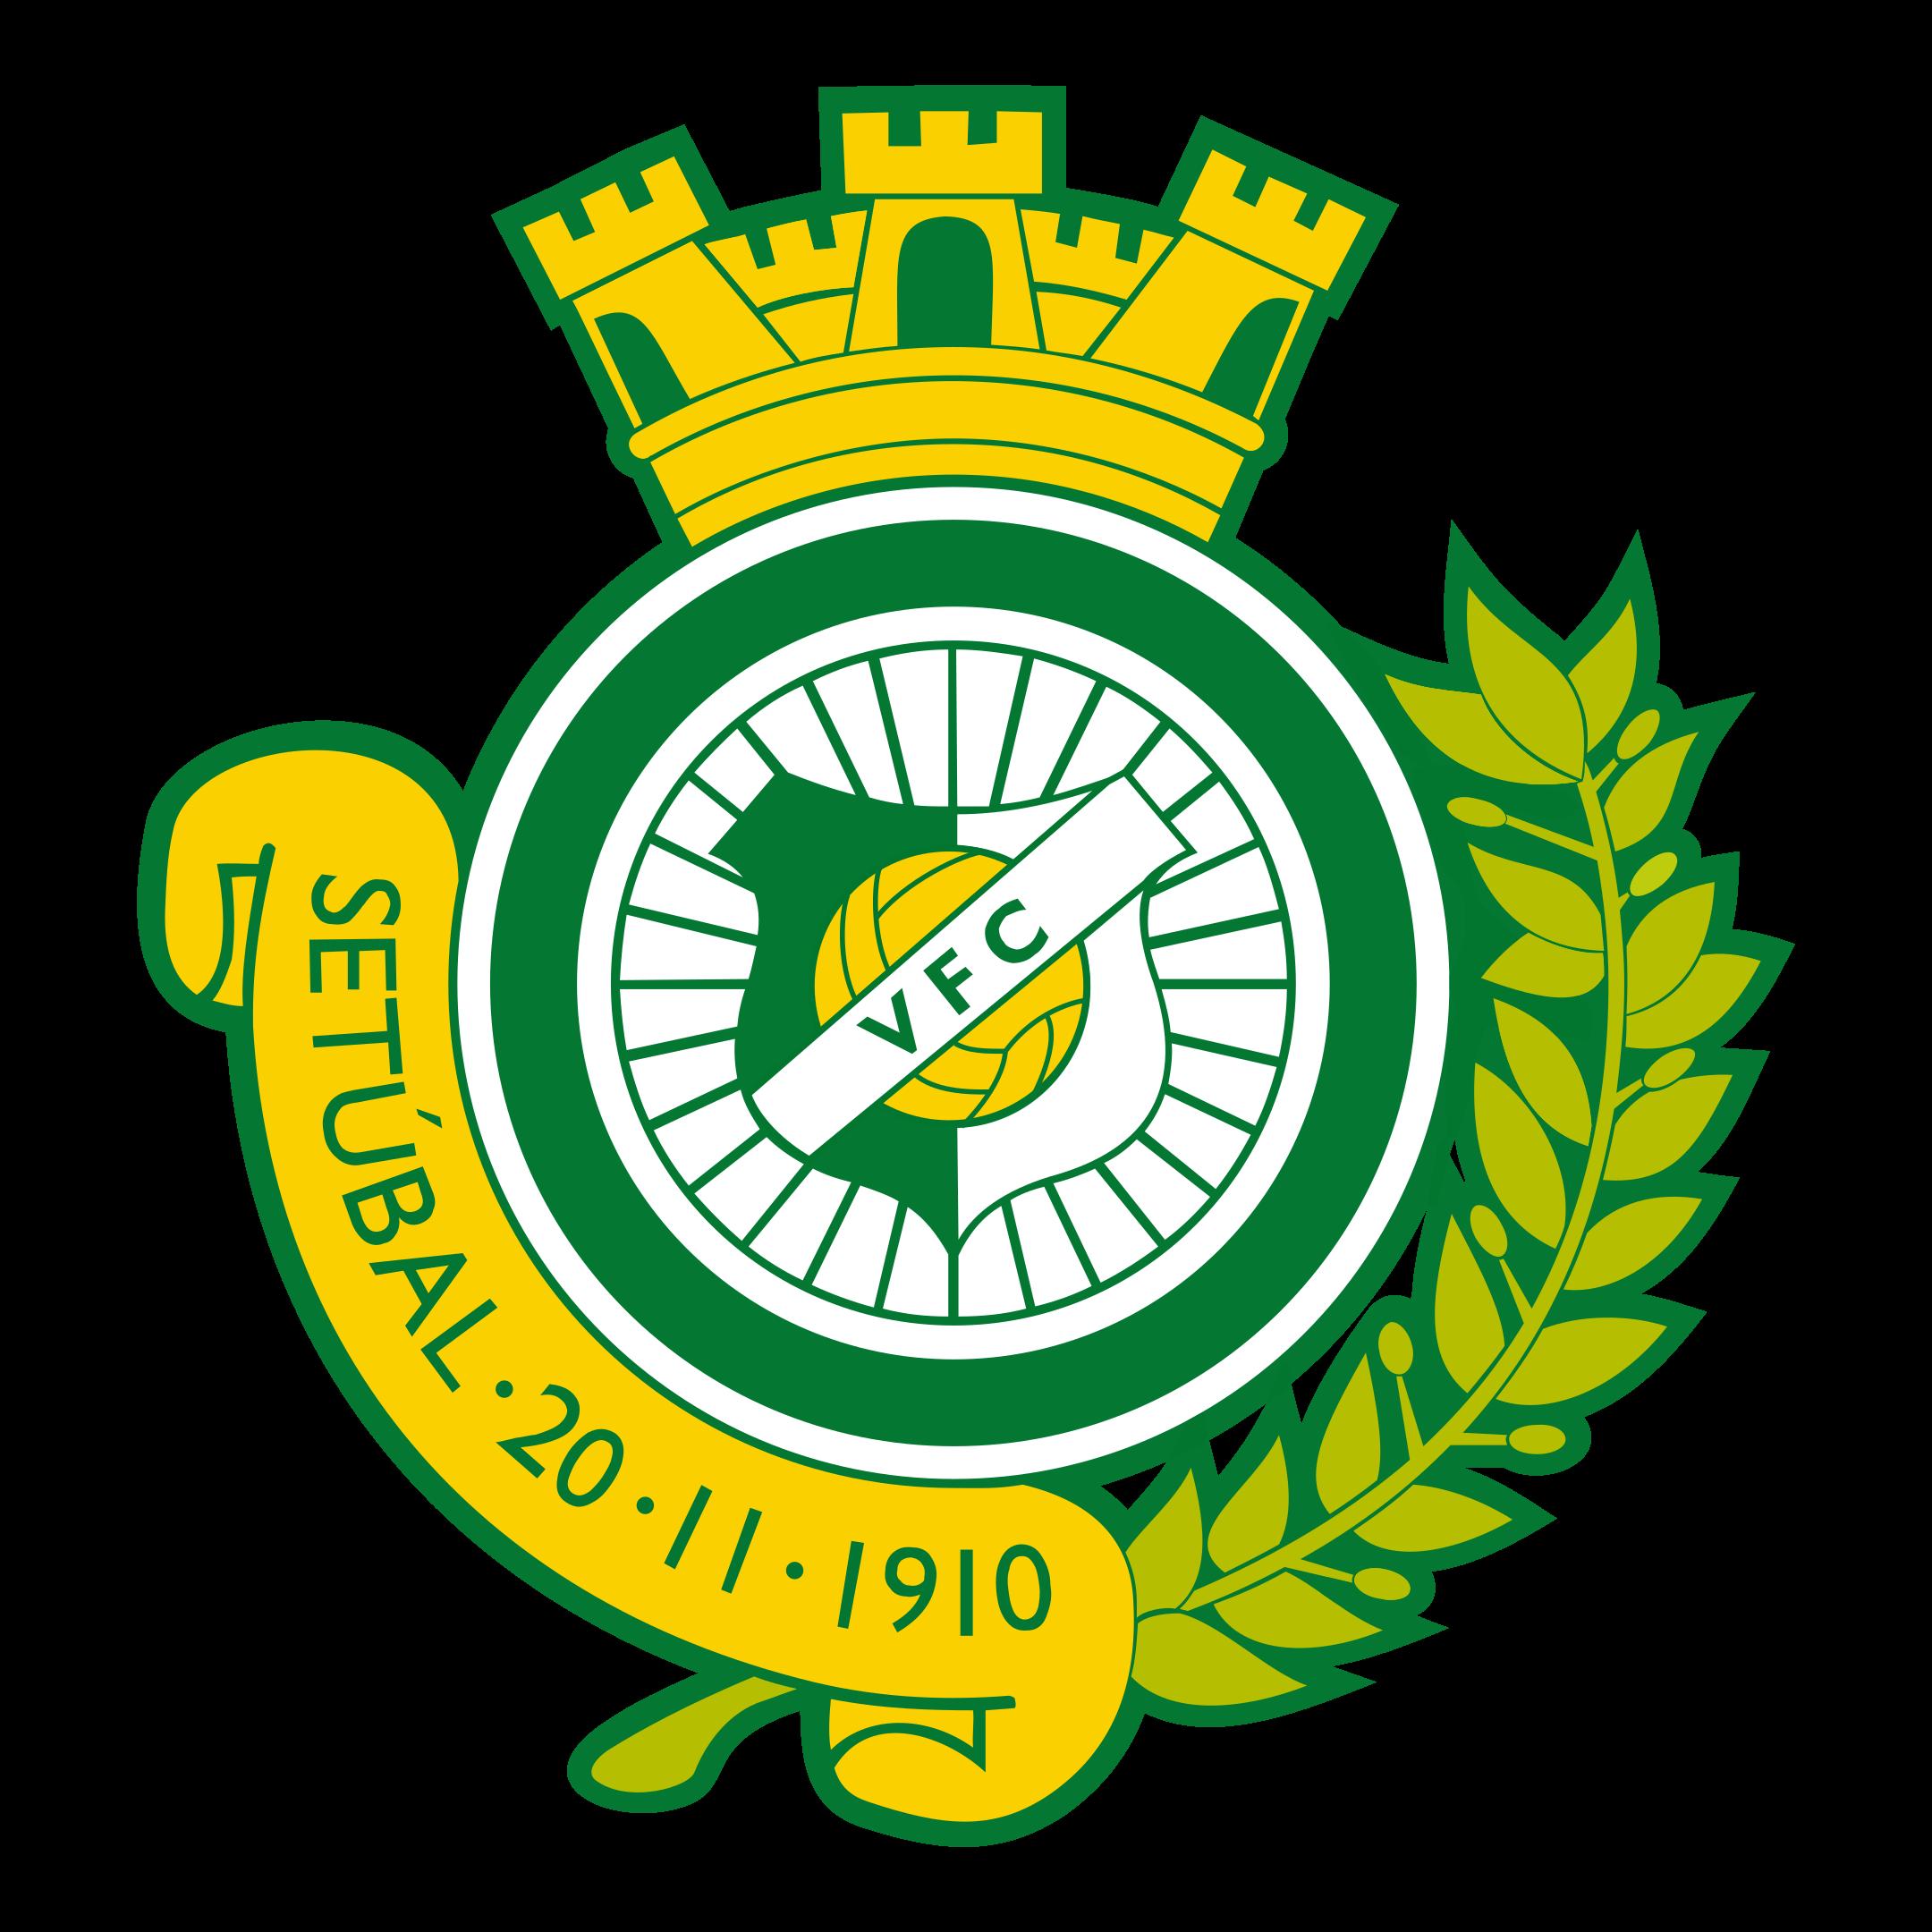 vitoria fc logo 1 - Vitória FC Logo